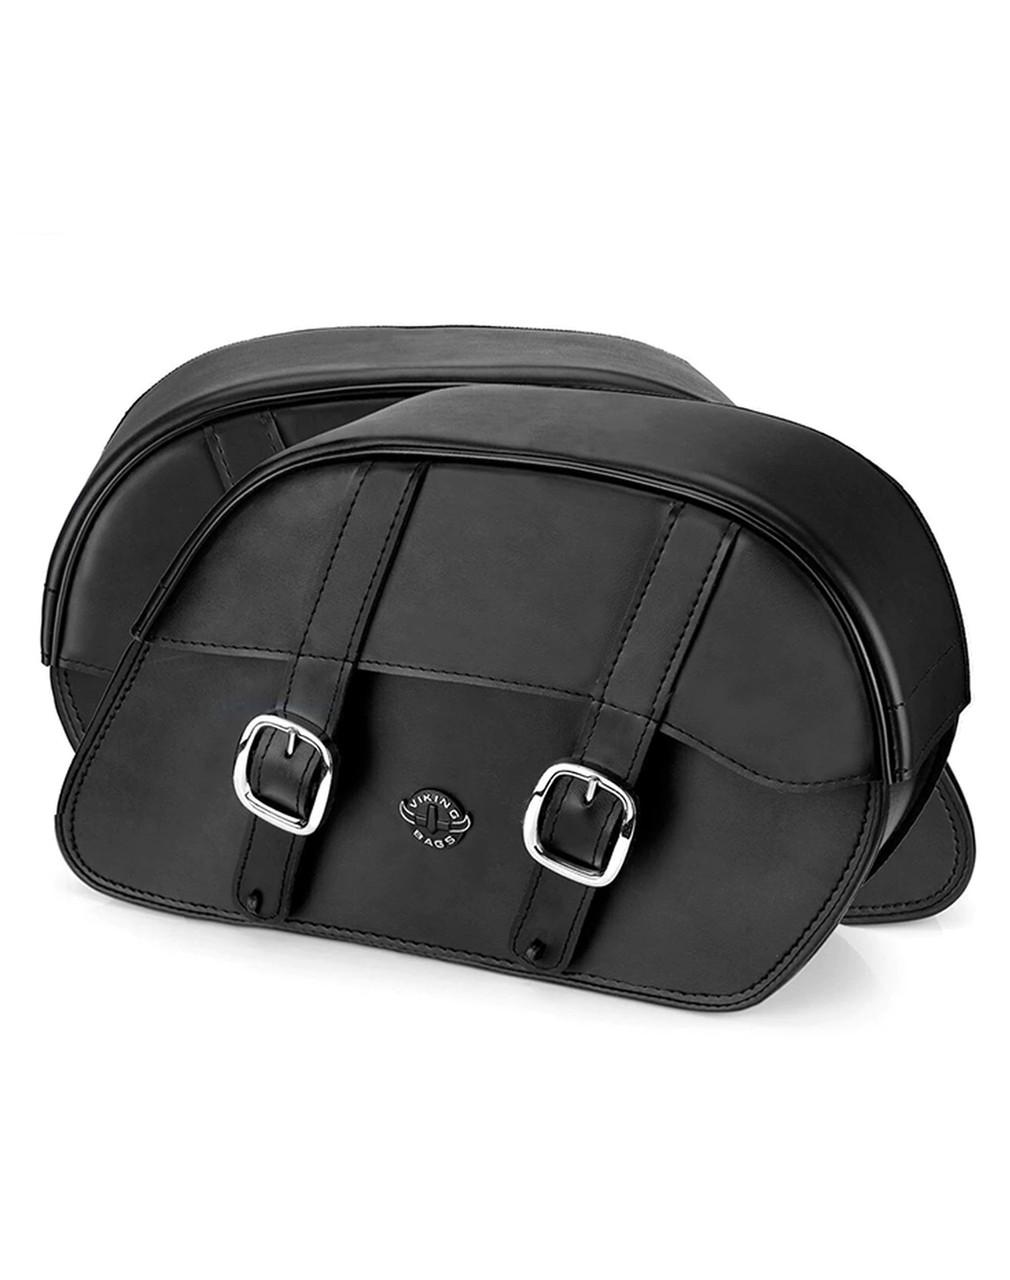 Honda VTX 1800 F Slanted L Motorcycle Saddlebags Both Bags view